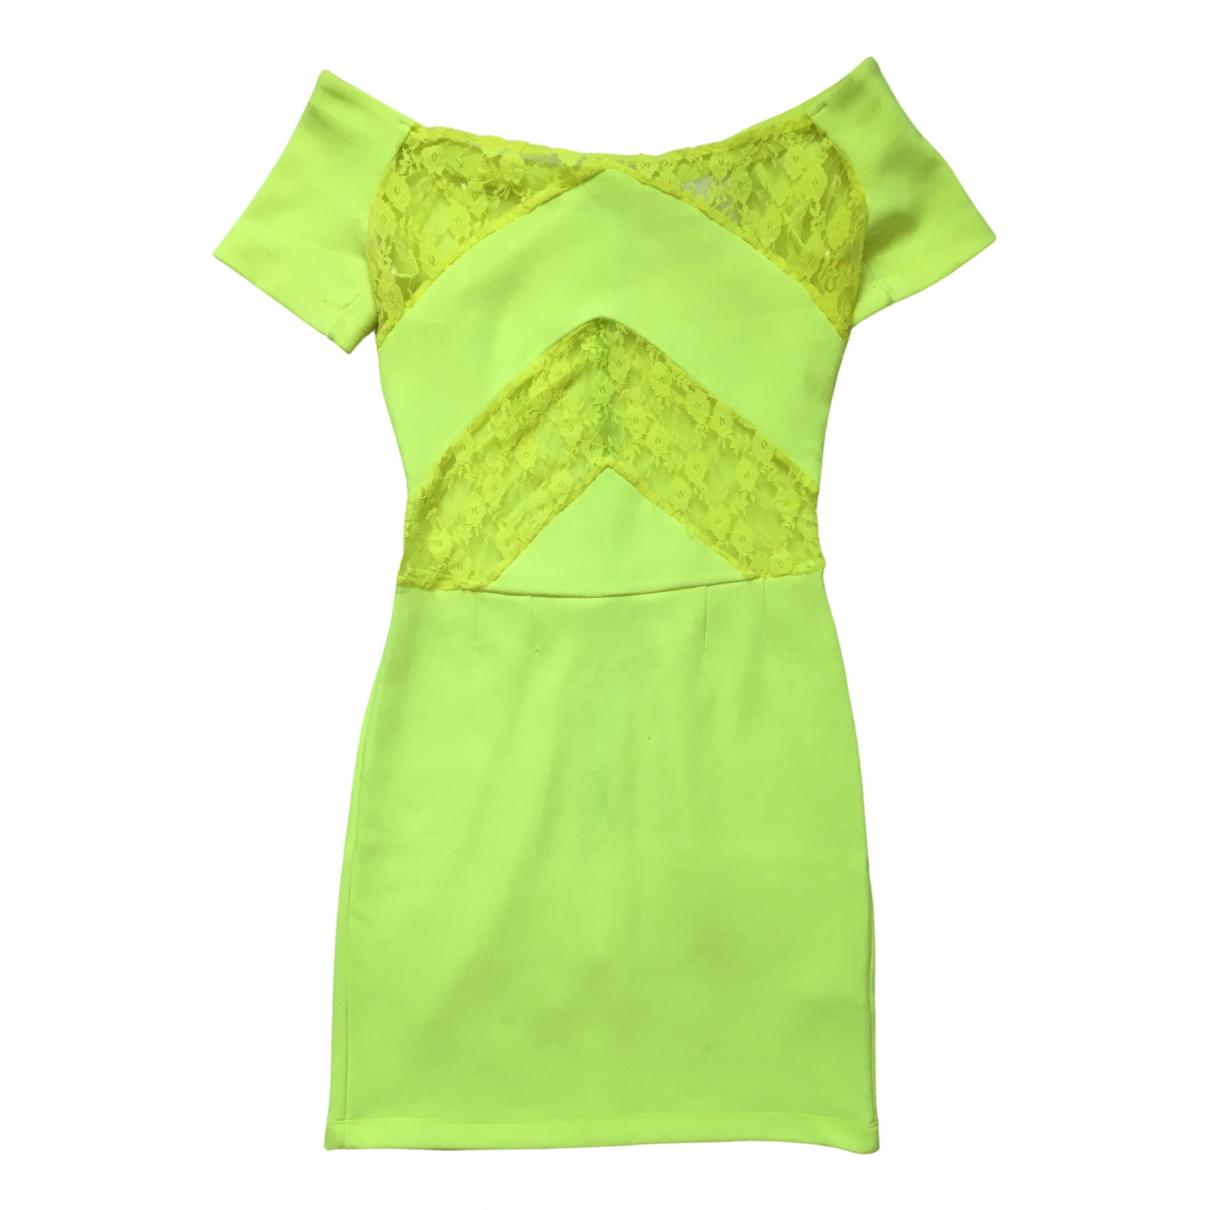 Christopher Kane For Tophop \N Kleid in  Gelb Polyester